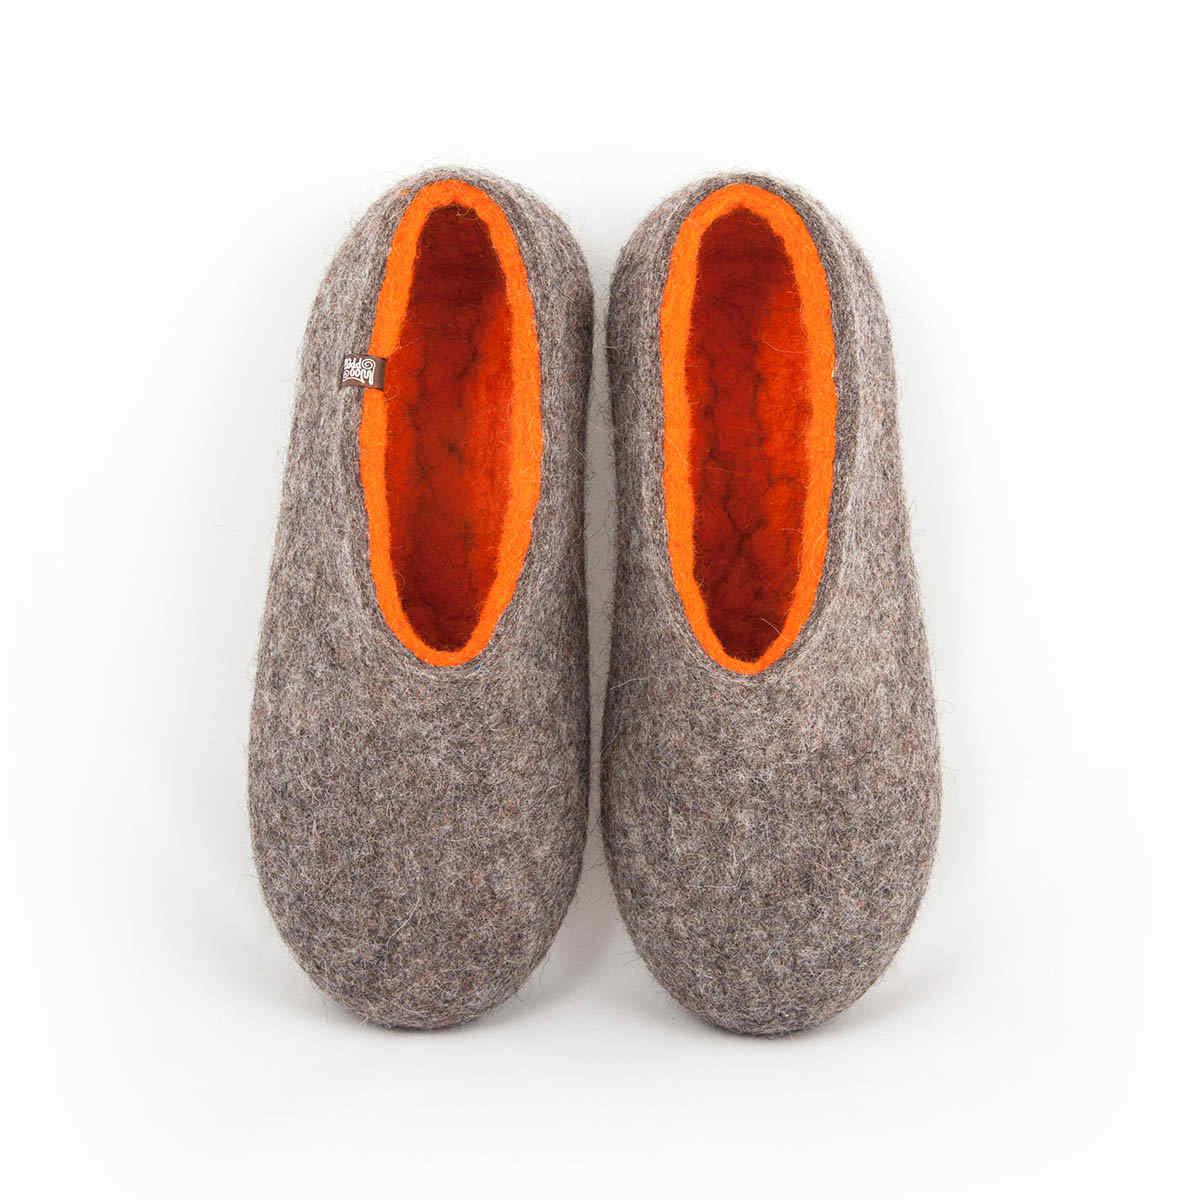 Boiled wool slippers DUAL NATURAL gray orange